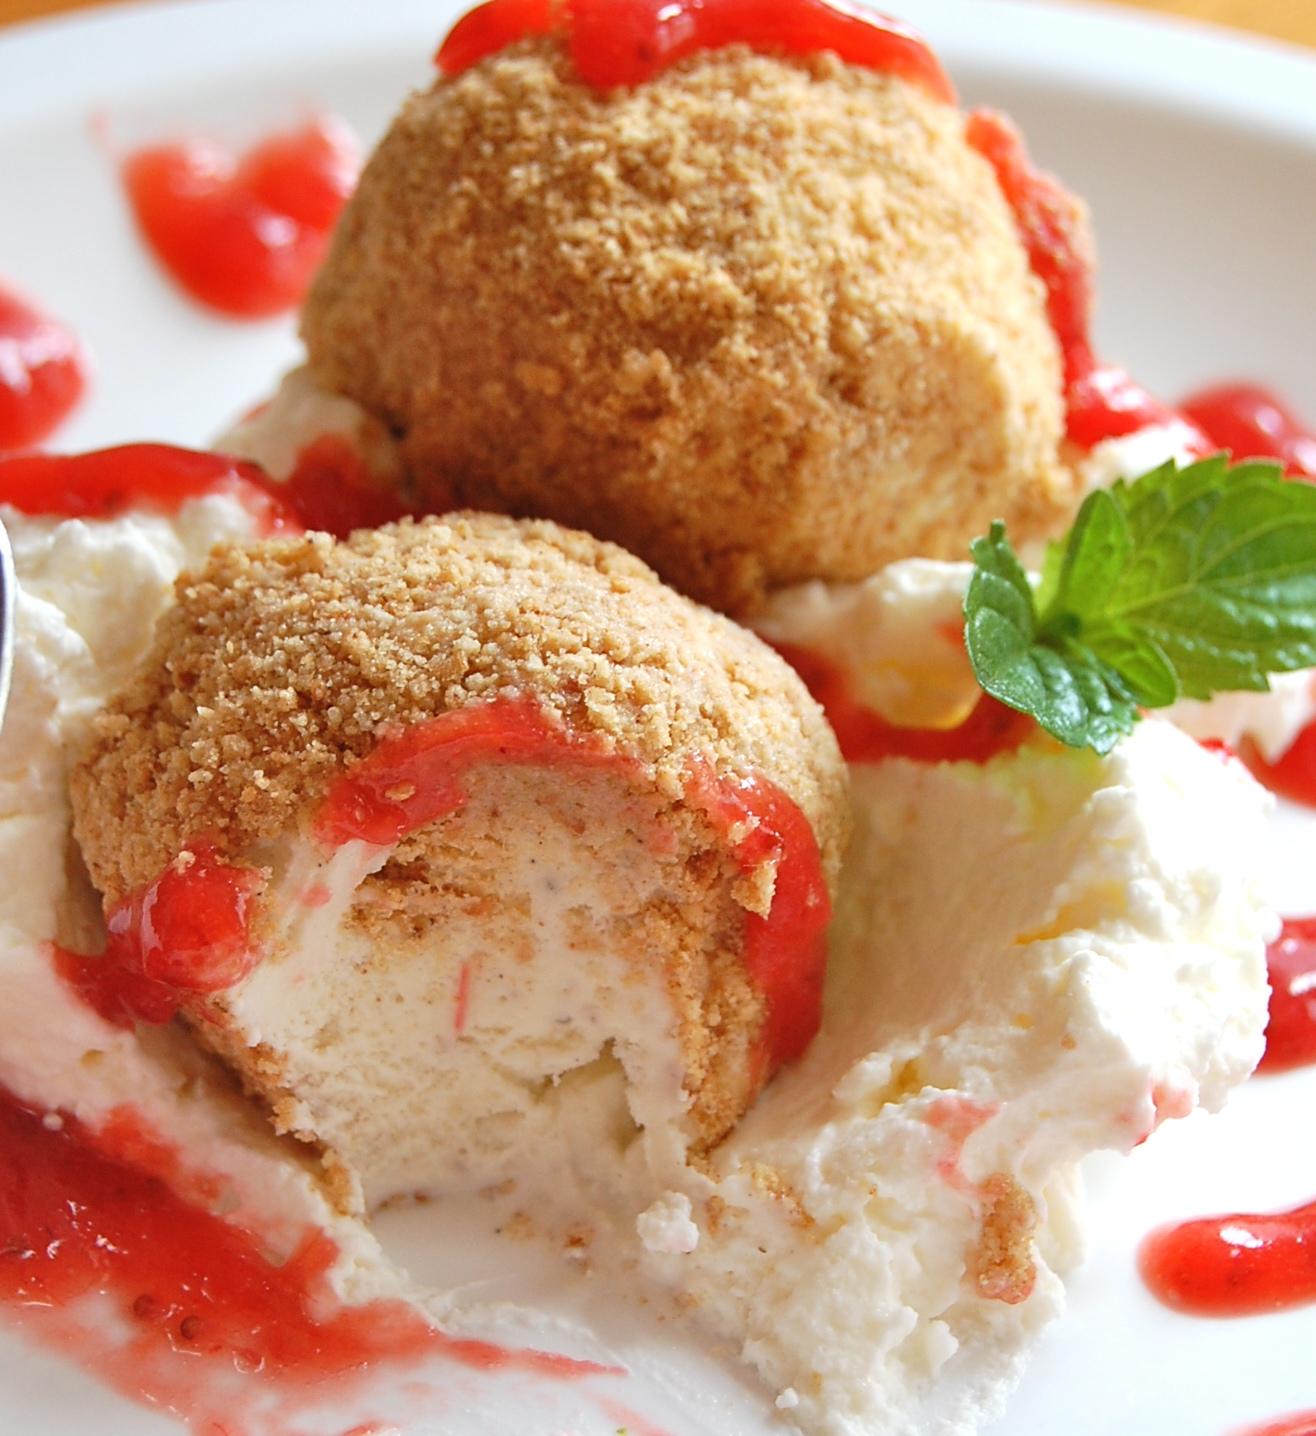 ... Graham Cracker Ice Cream Pie Sundae with a Strawberry-Rhubarb Vanilla